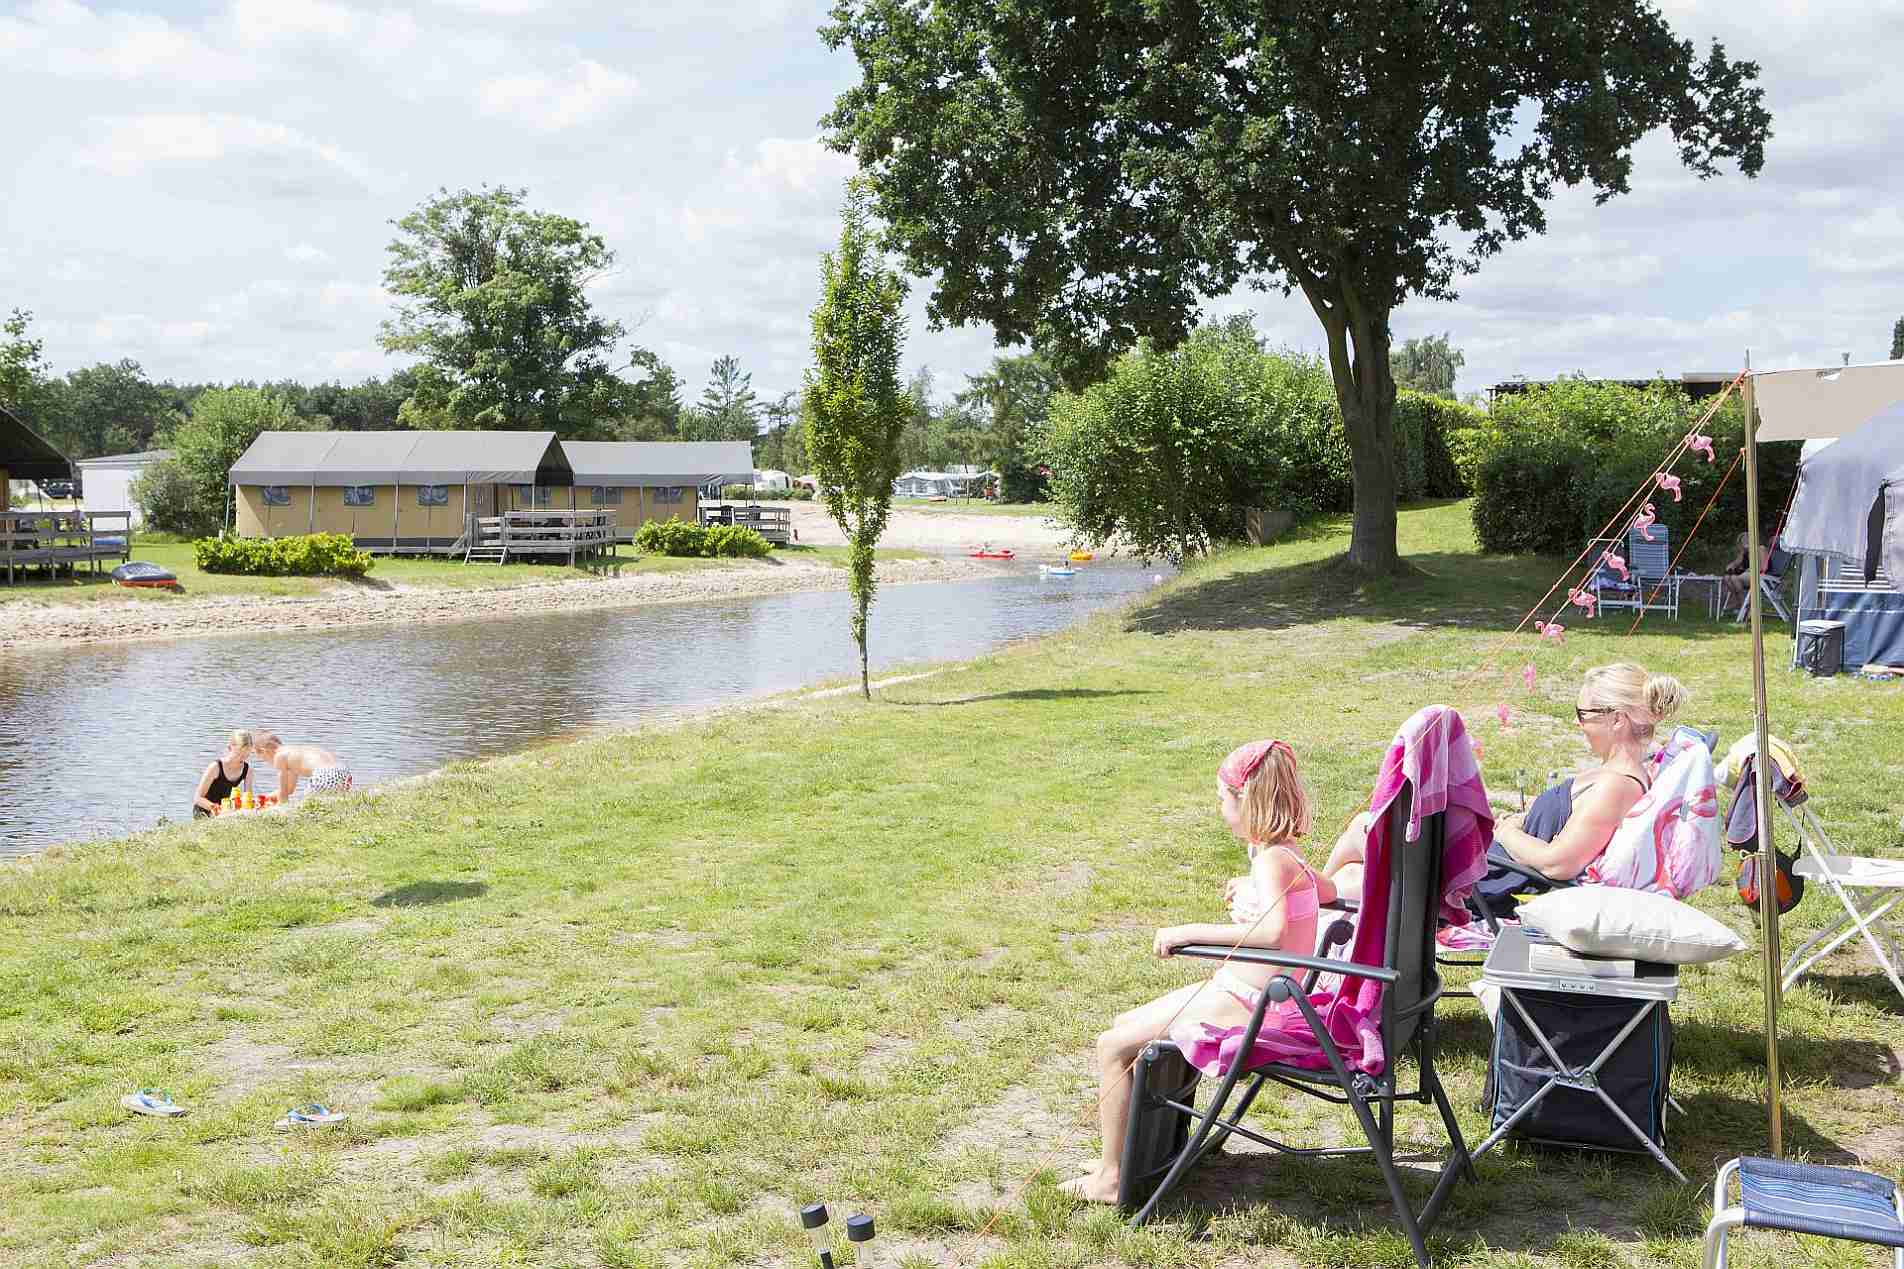 5-Sterne Familiencampingplatz in Holland - Familiencampingplatz in Holland